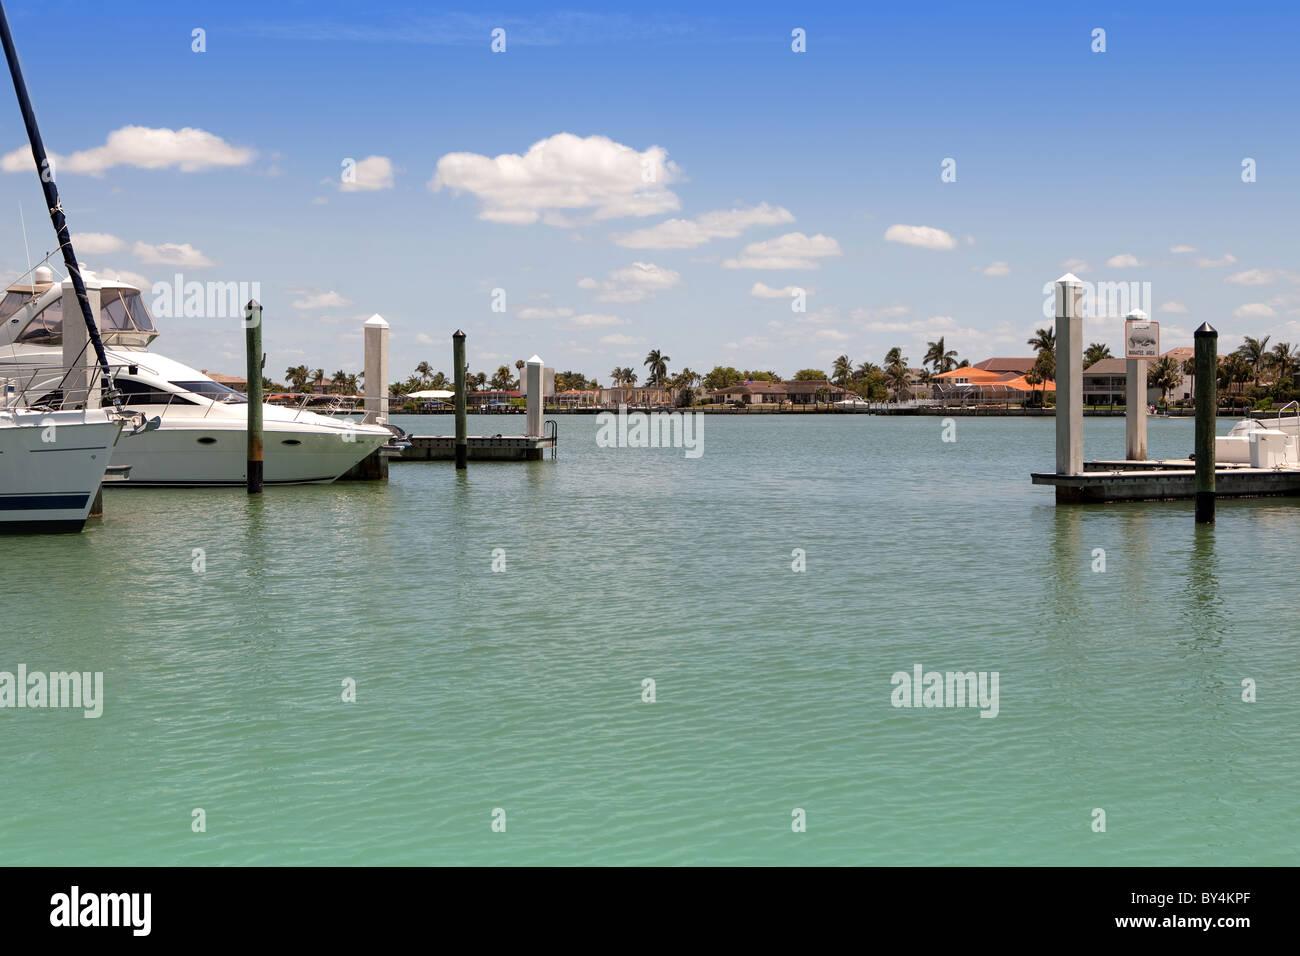 Florida Marco Island Marina Stockbild